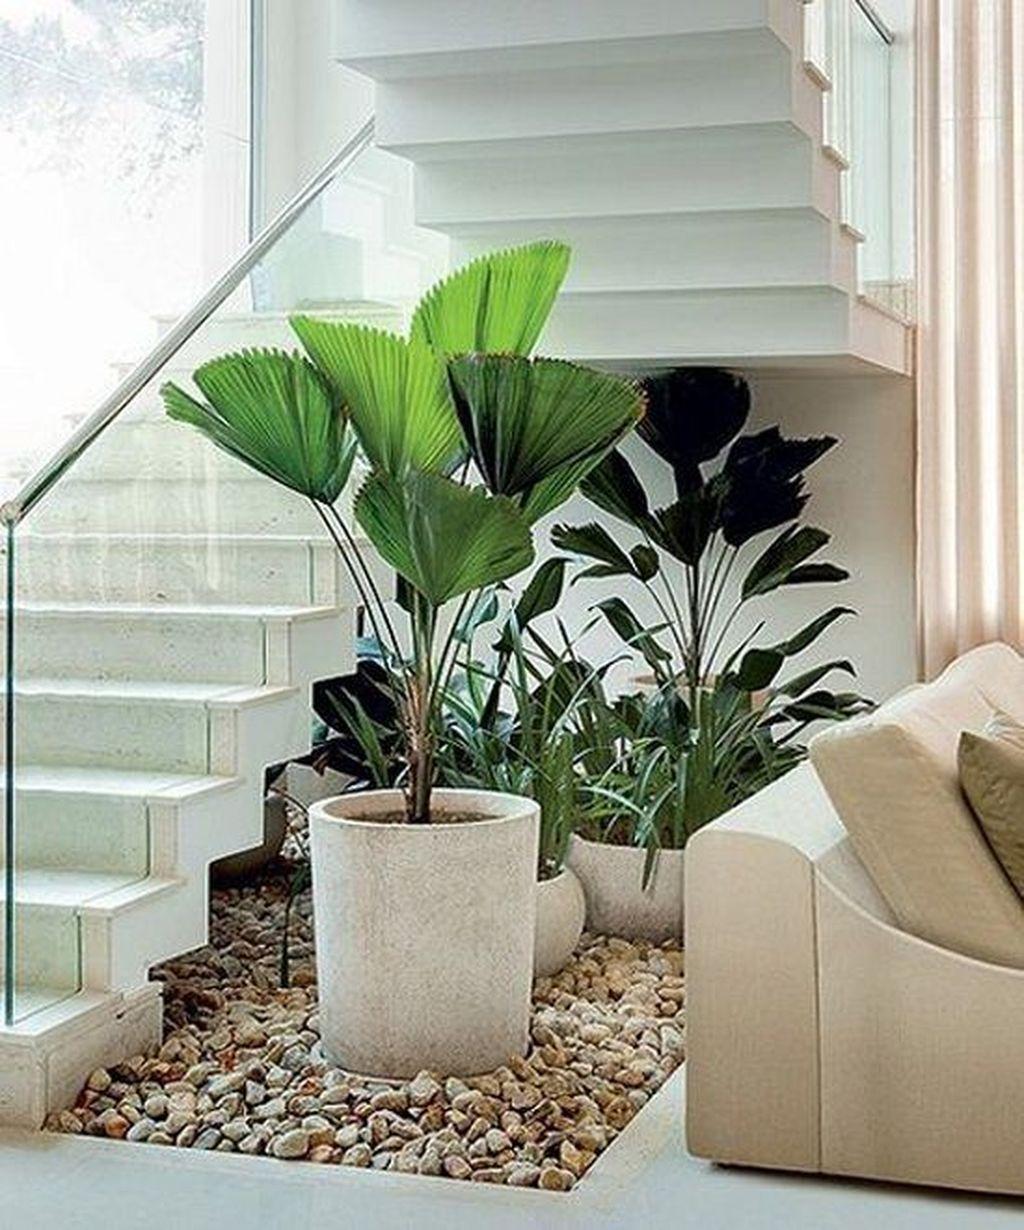 The Best Indoor Garden Ideas To Beautify Your Home 13